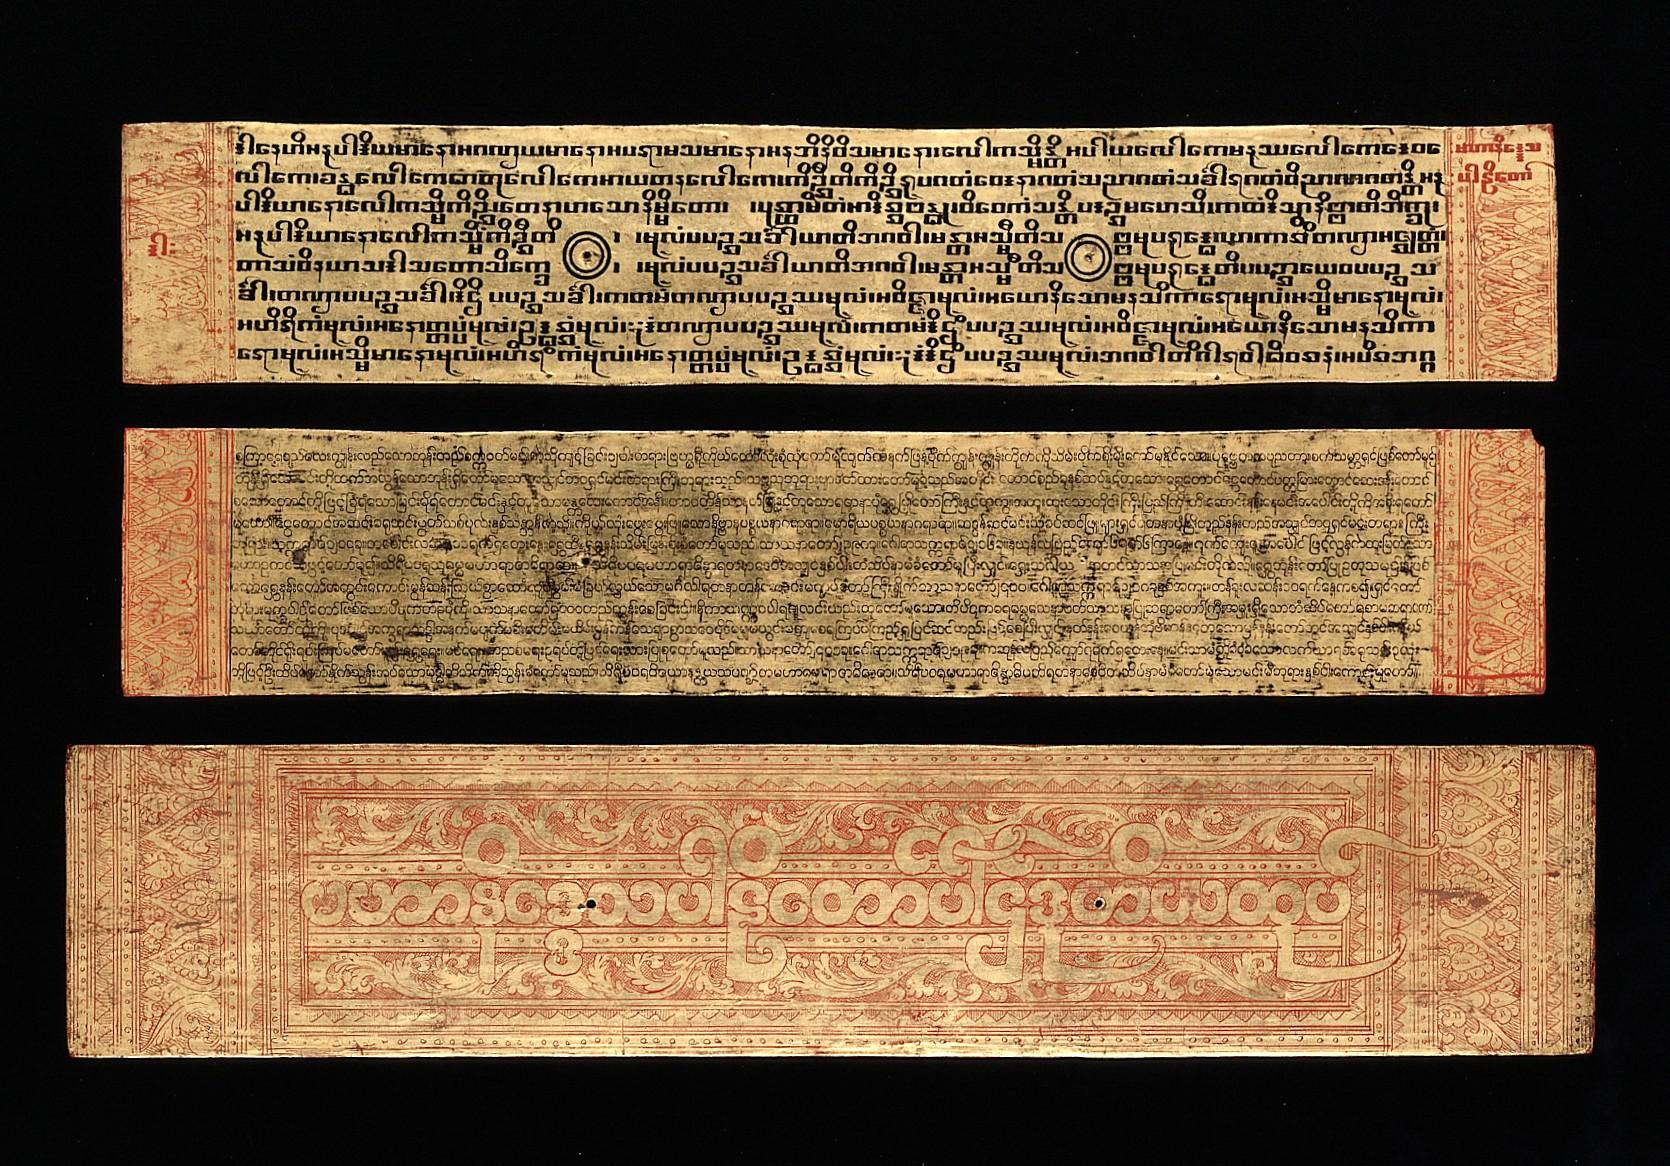 Burmese-Pali manuscript copy of the Buddhist text Mahāniddesa